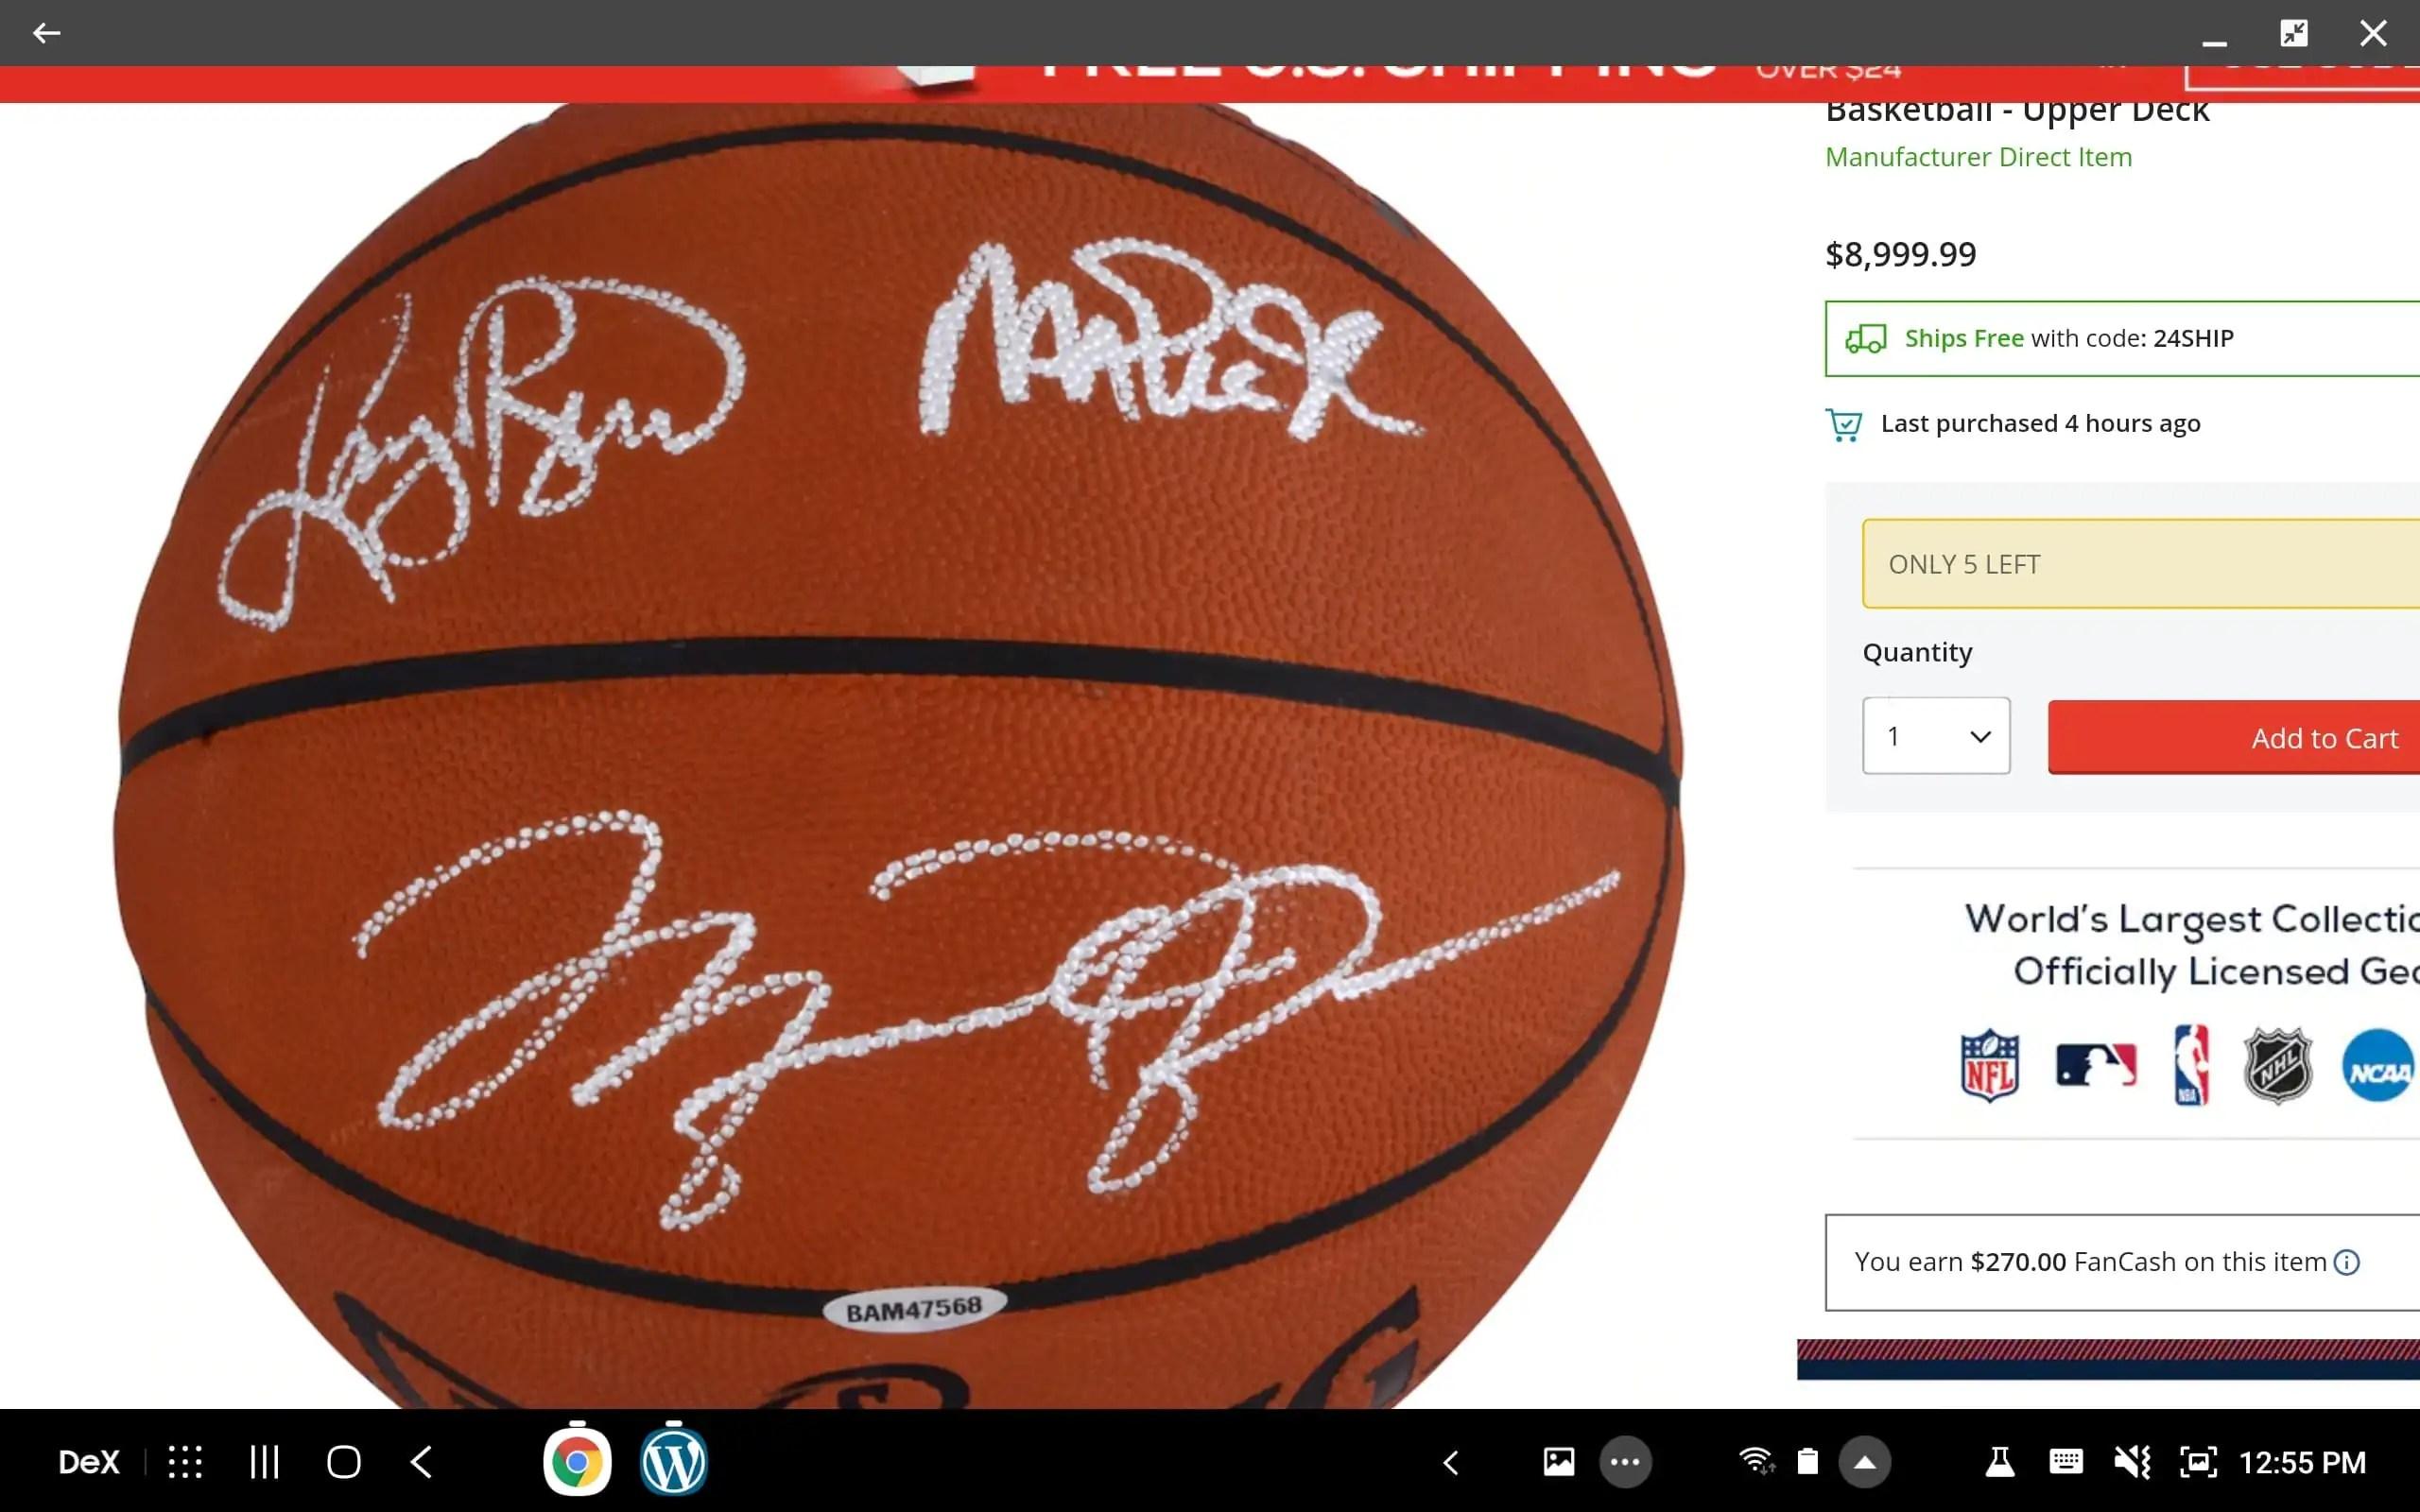 Bird, Magic, and Jordan Autographed Ball via @PhillyWhat